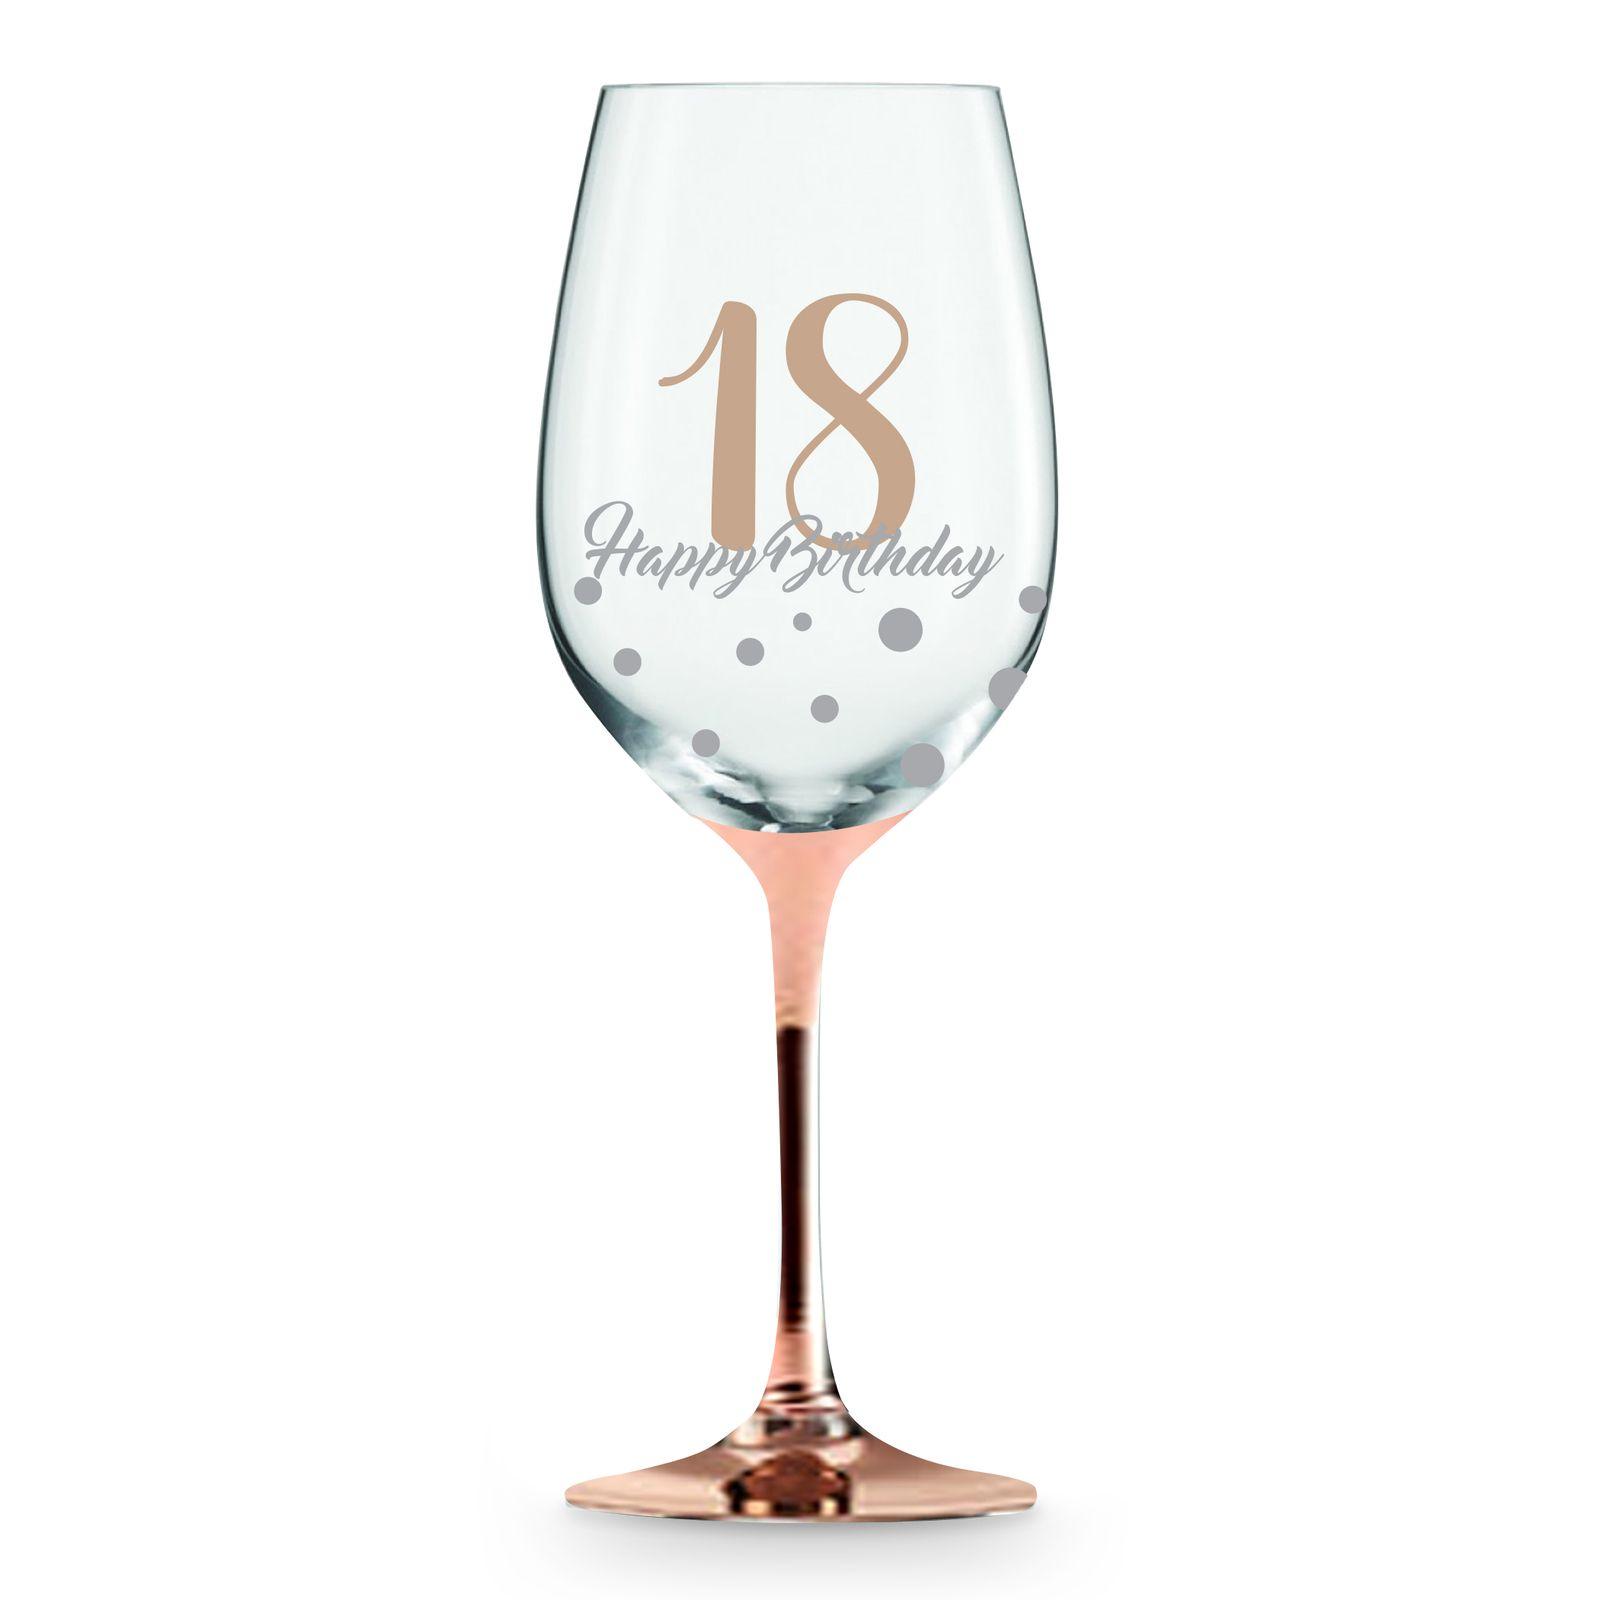 Rose Stem 18th Birthday Wine Glass Birthday Wine Glasses Wine